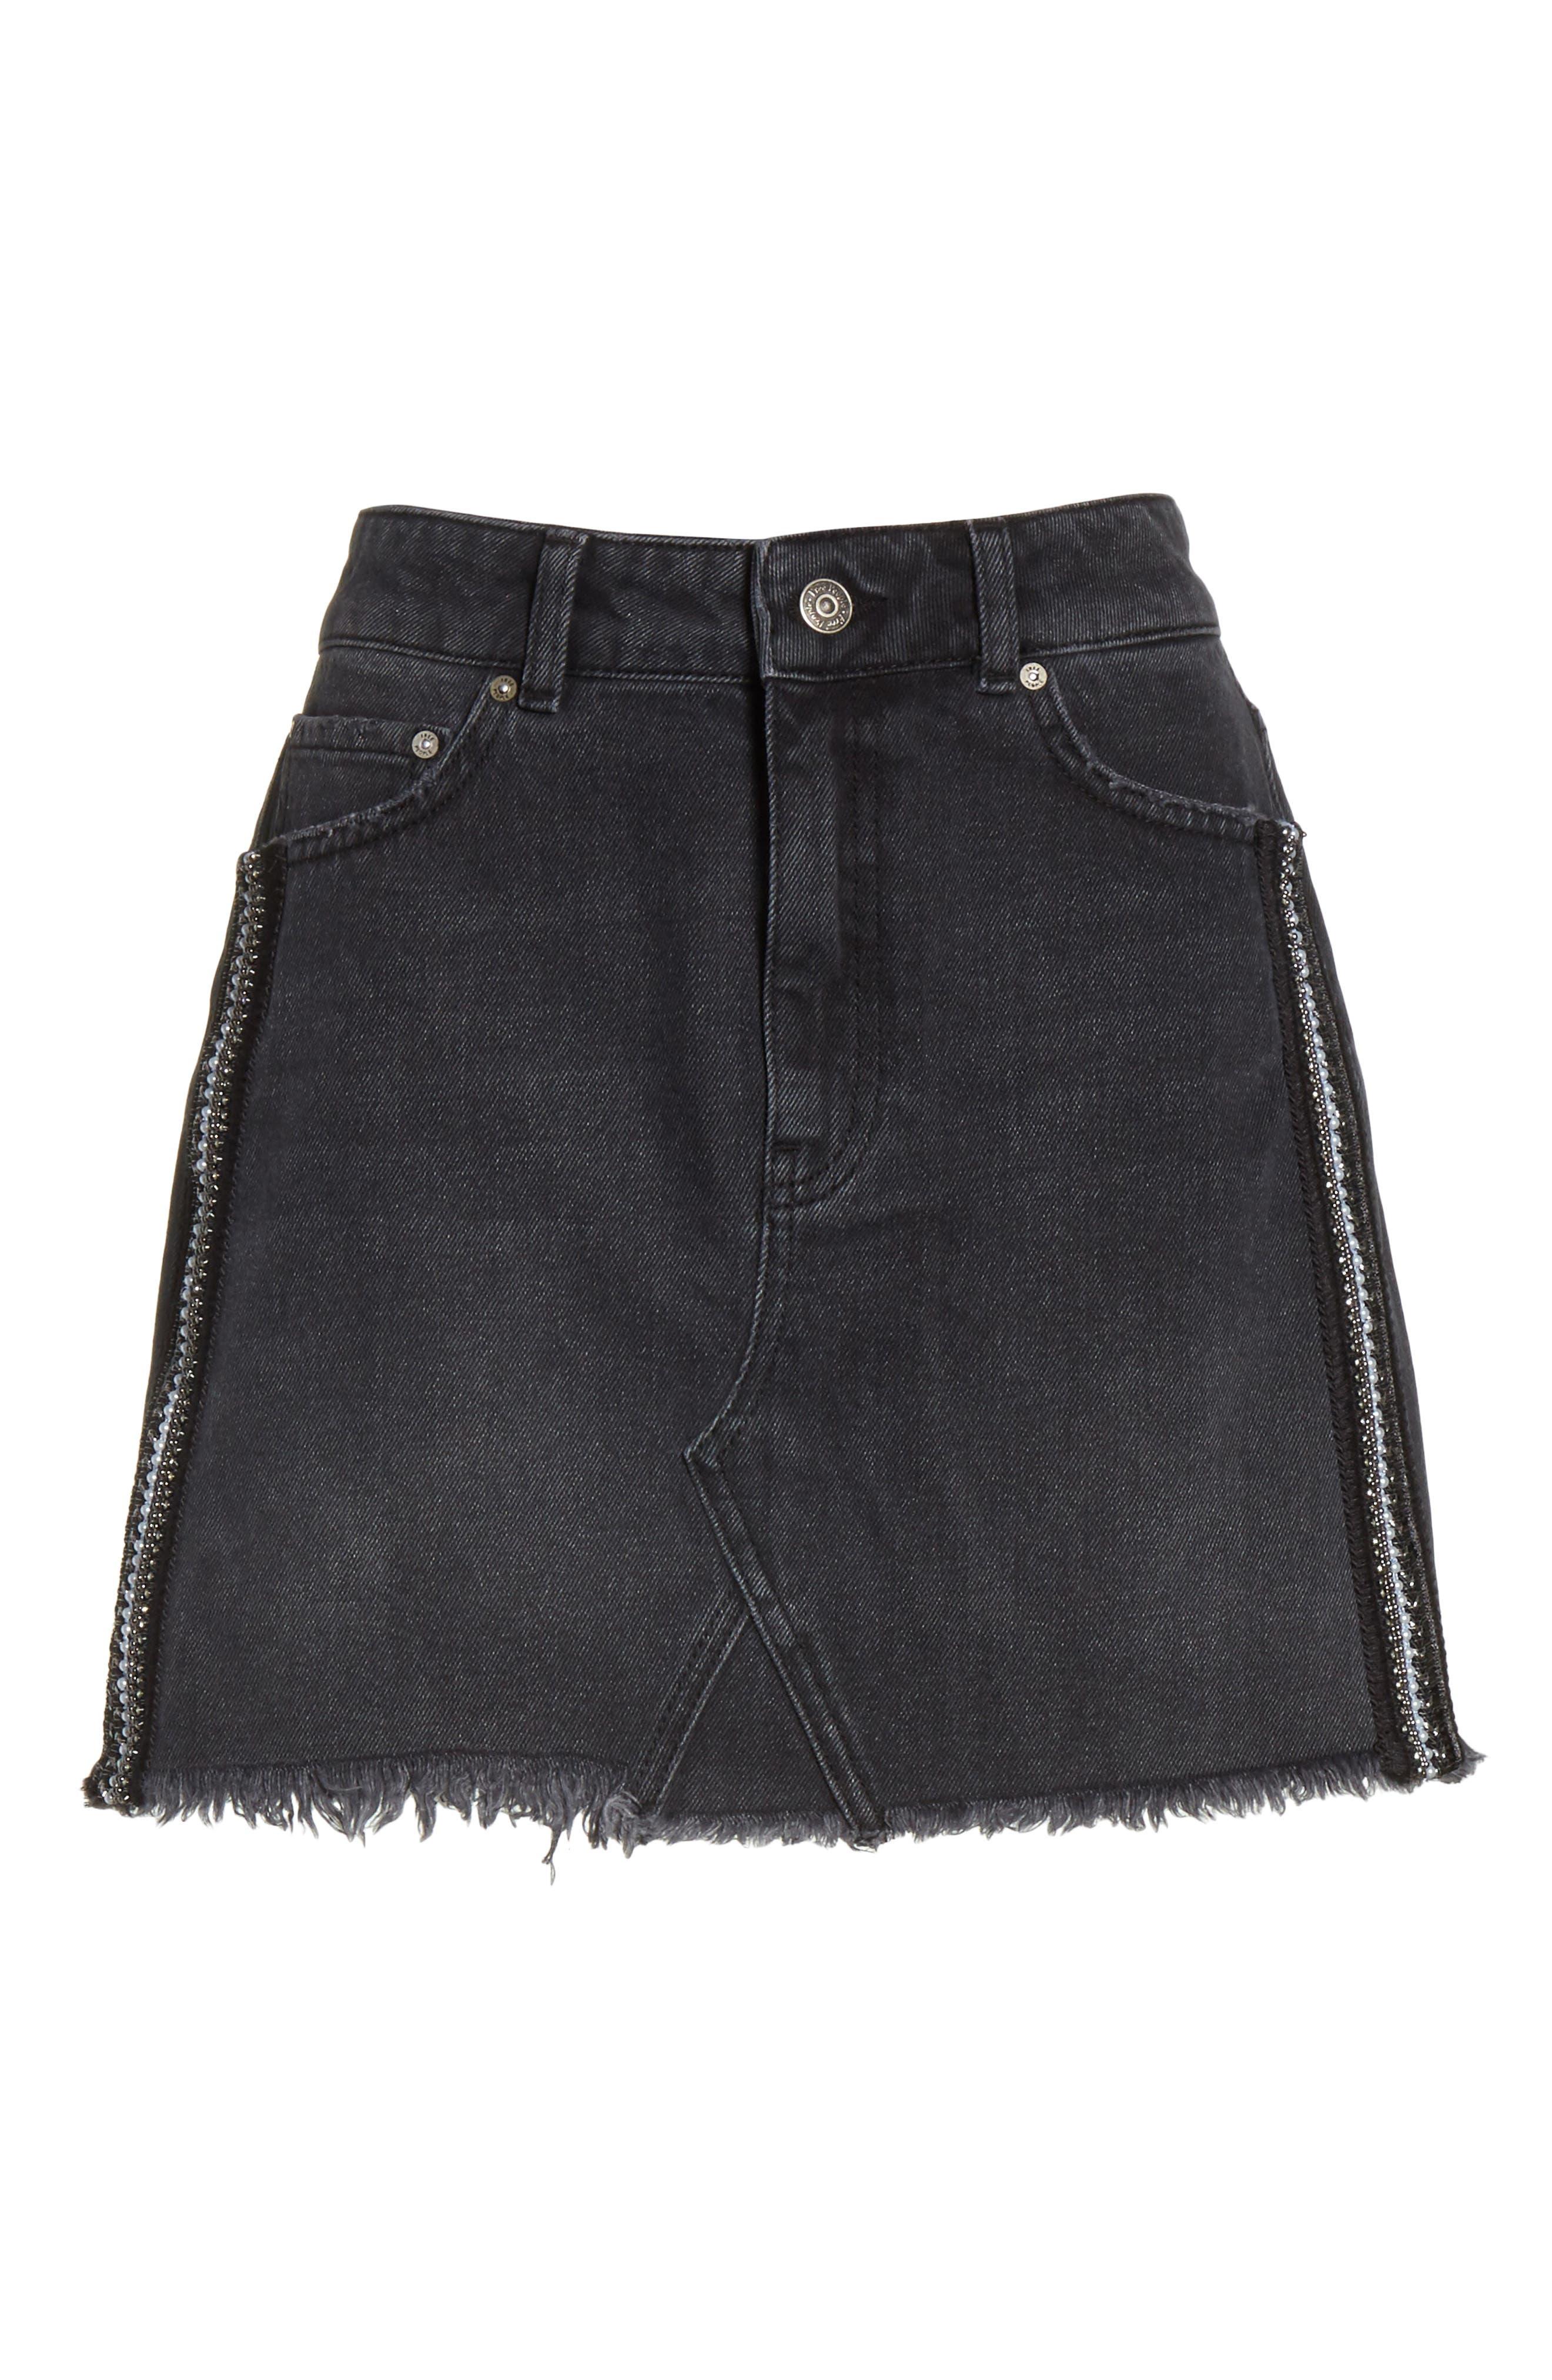 FREE PEOPLE,                             Stripe Cutoff Denim Miniskirt,                             Alternate thumbnail 6, color,                             001